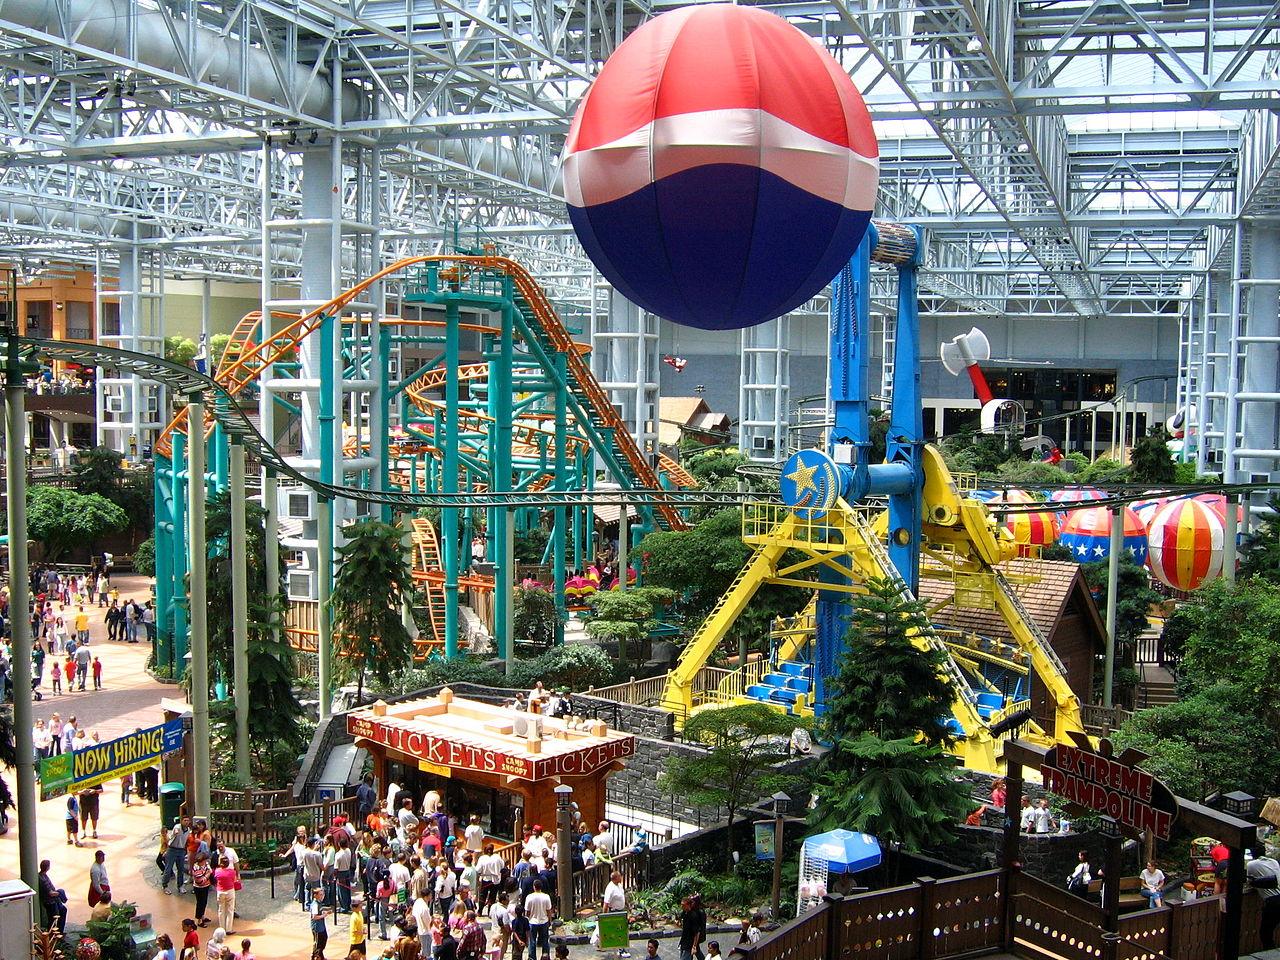 Mall of america bloomington minnesota tourist destinations 1280px mallofamerica jameslax Images